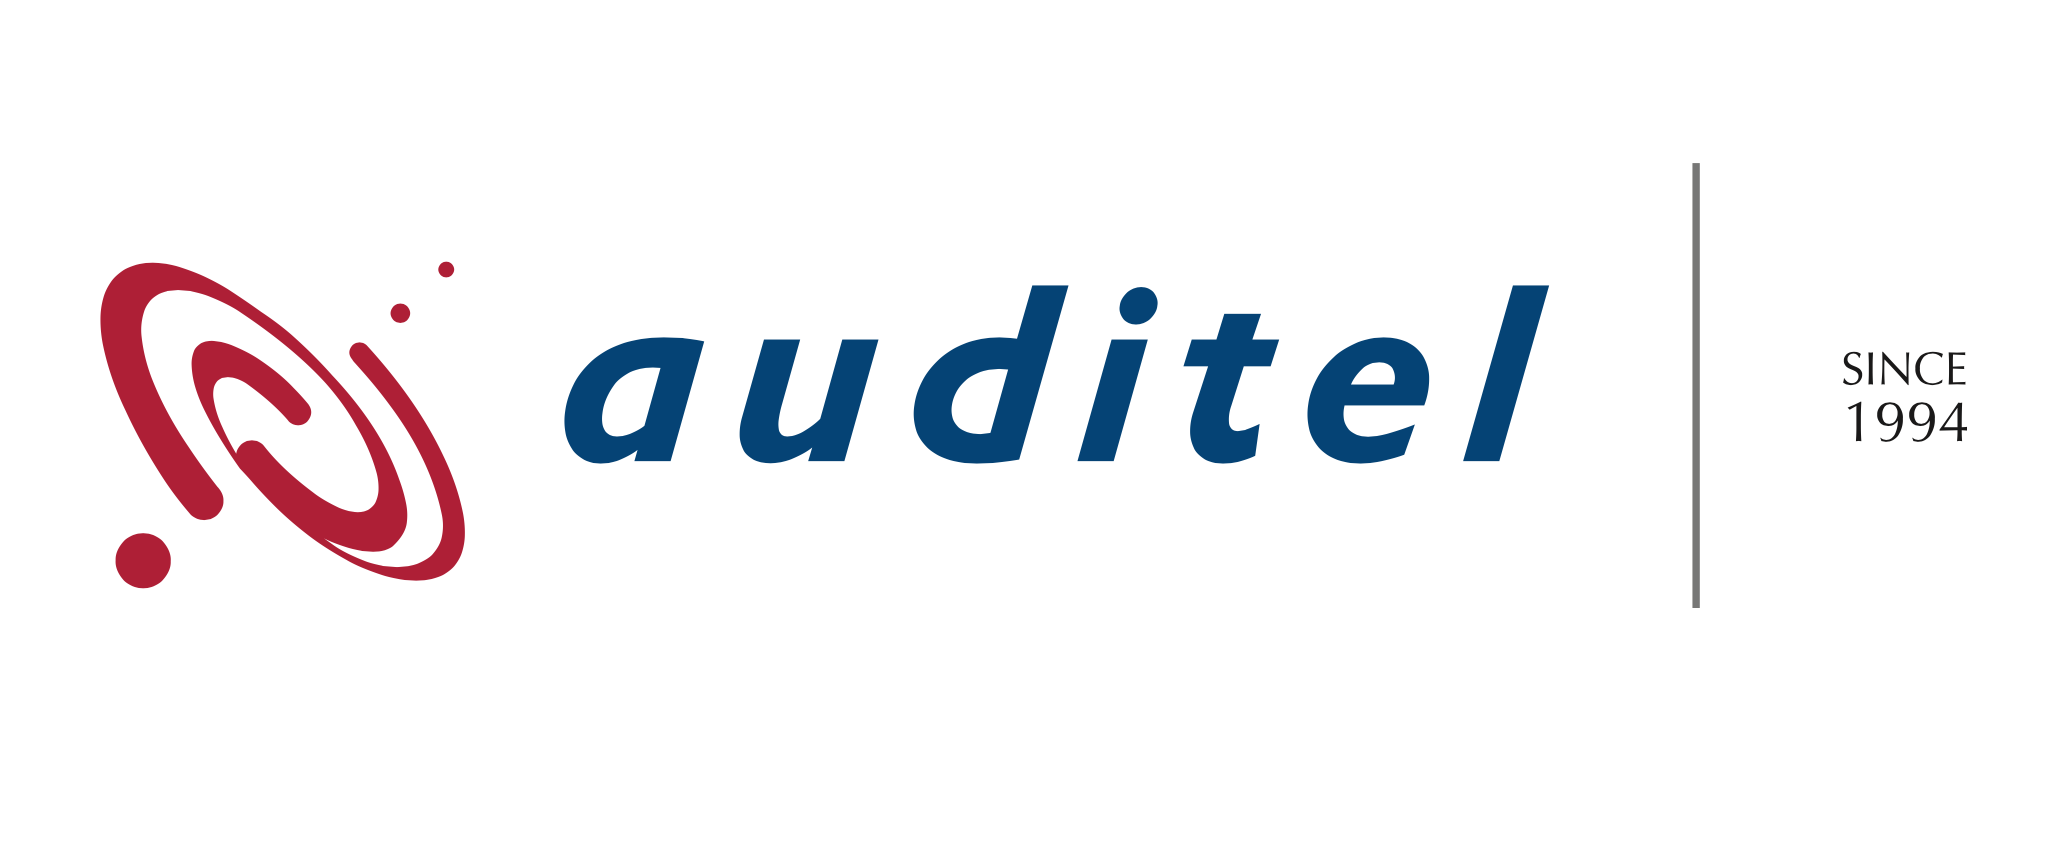 Auditel franchise logo